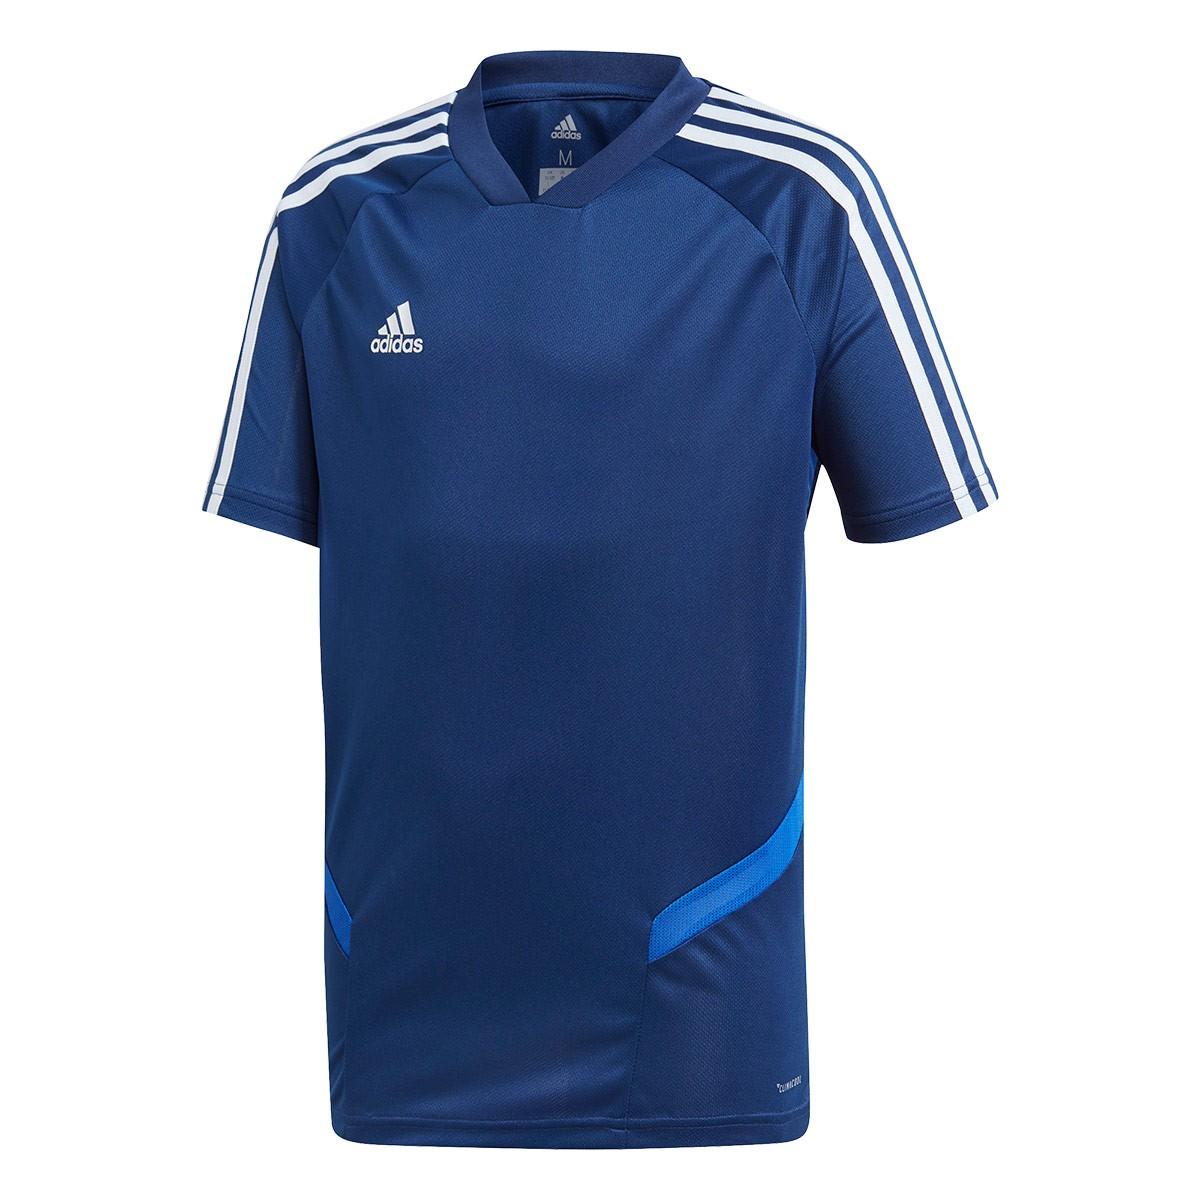 fa6fe7f0cb8c27 Maglia adidas Tiro 19 Training m/c Junior Dark blue-Bold blue-White -  Negozio di calcio Fútbol Emotion